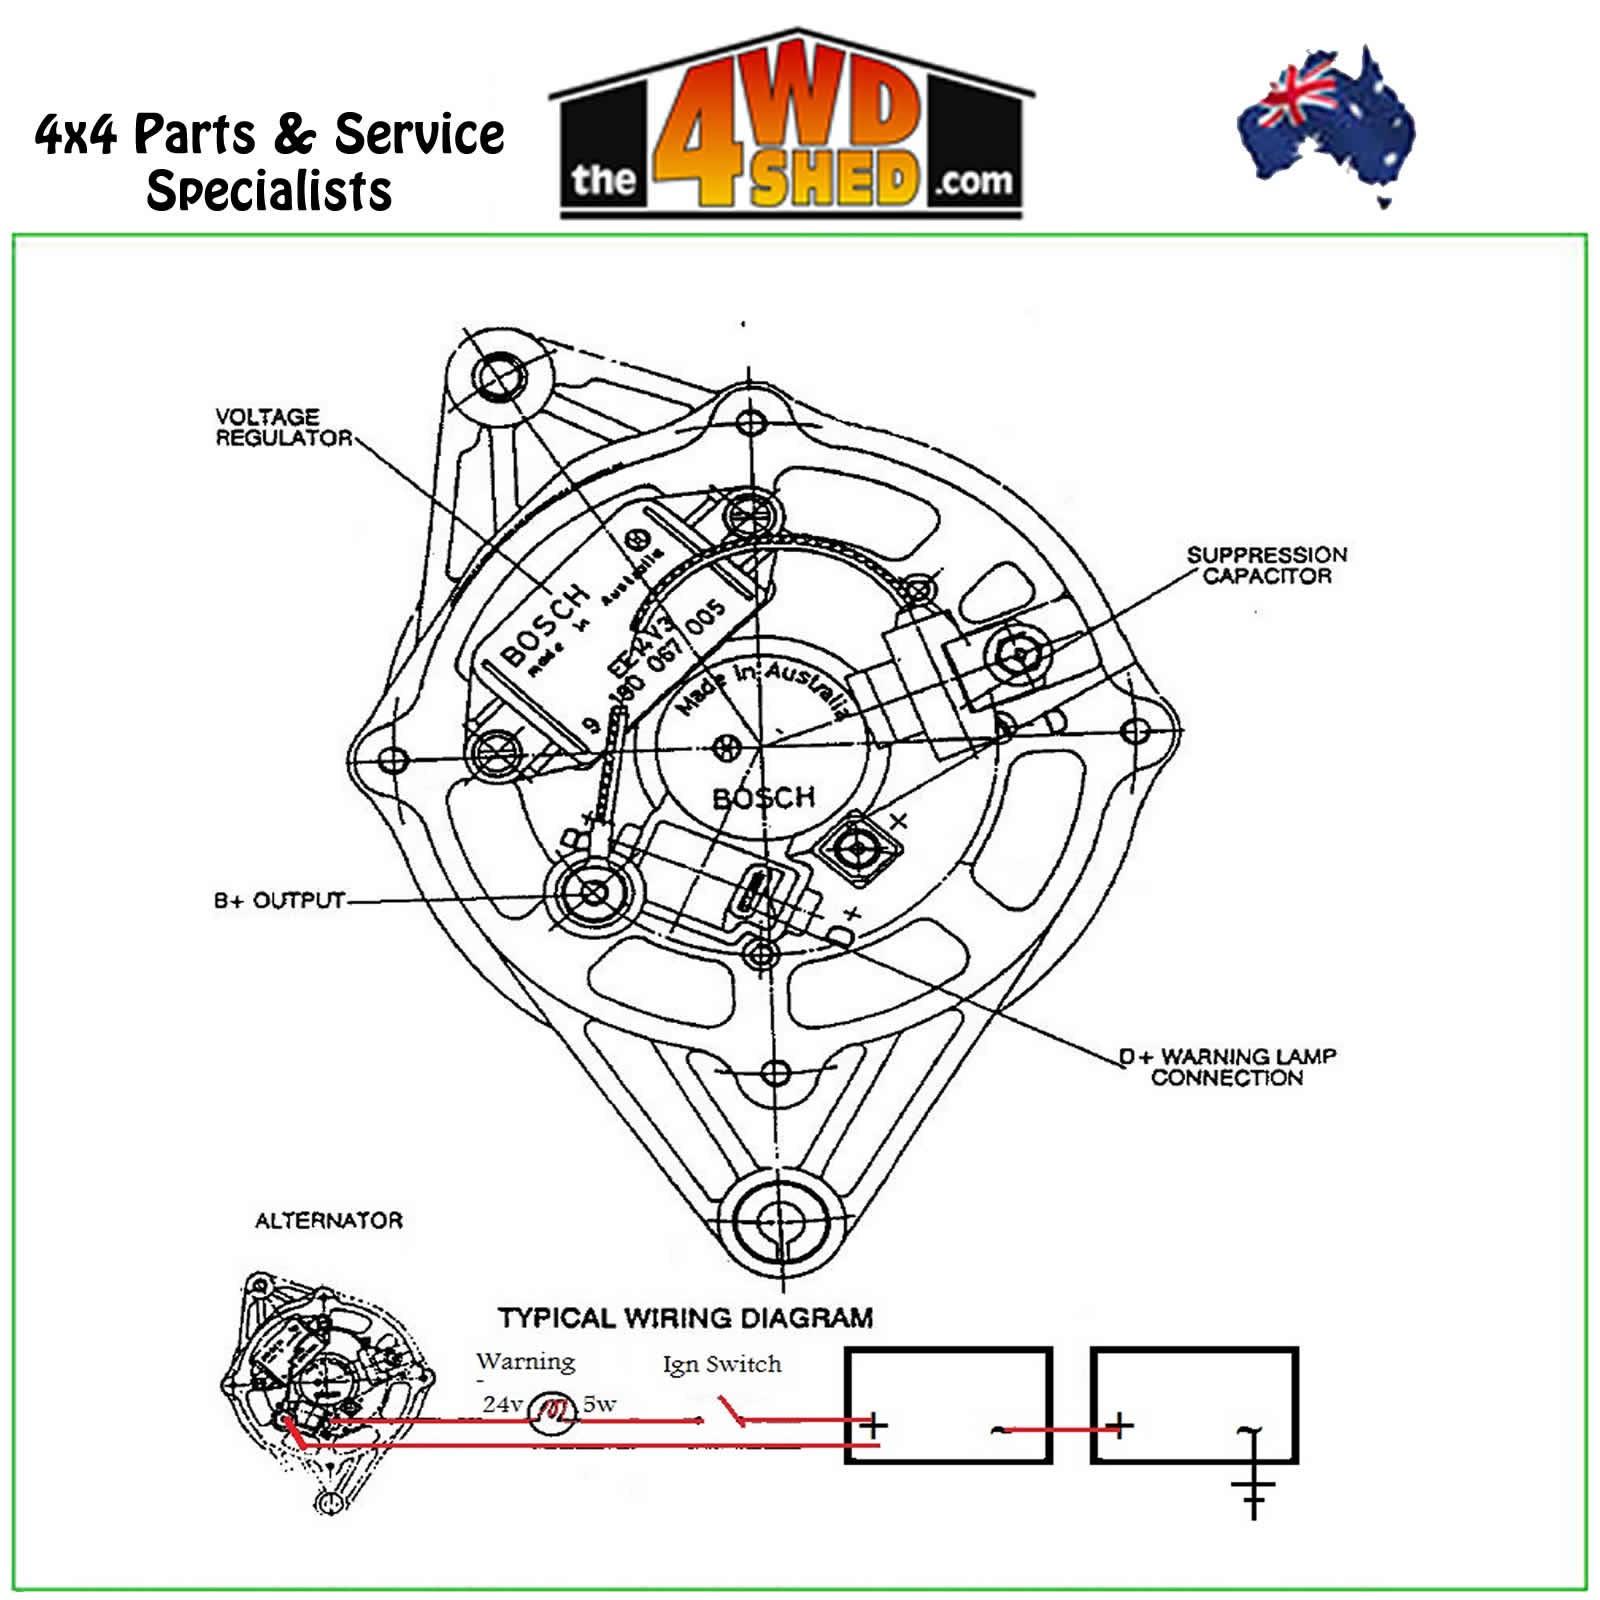 Valeo Alternator Wiring Diagram Bosch Generator Wiring Diagram Reference Amazing Bosch Alternator Of Valeo Alternator Wiring Diagram